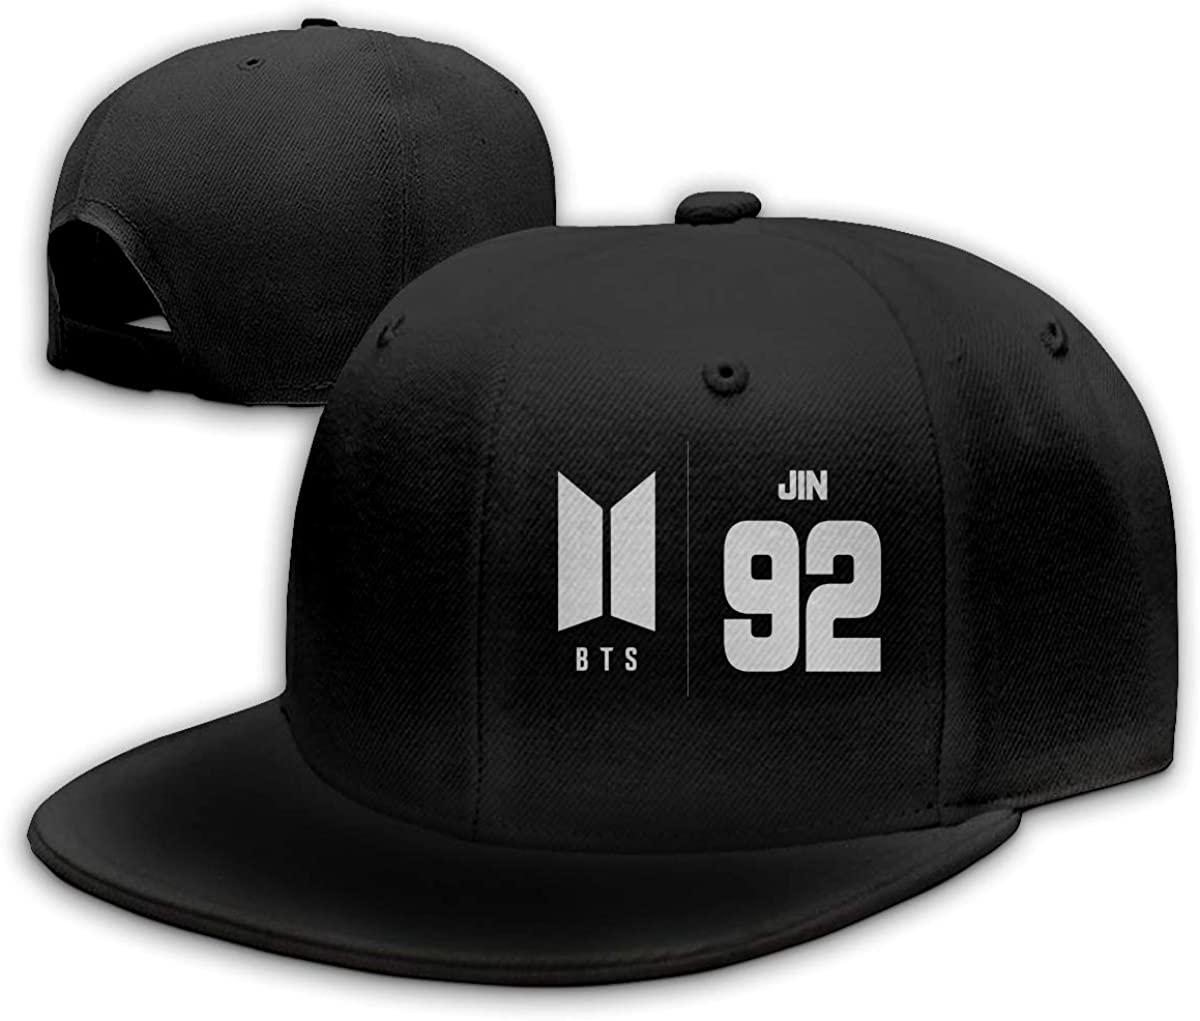 Kpop BTS Casquette Hip Hop Hat Outdoor Baseball Cap Classic Adjustable Unisex Black